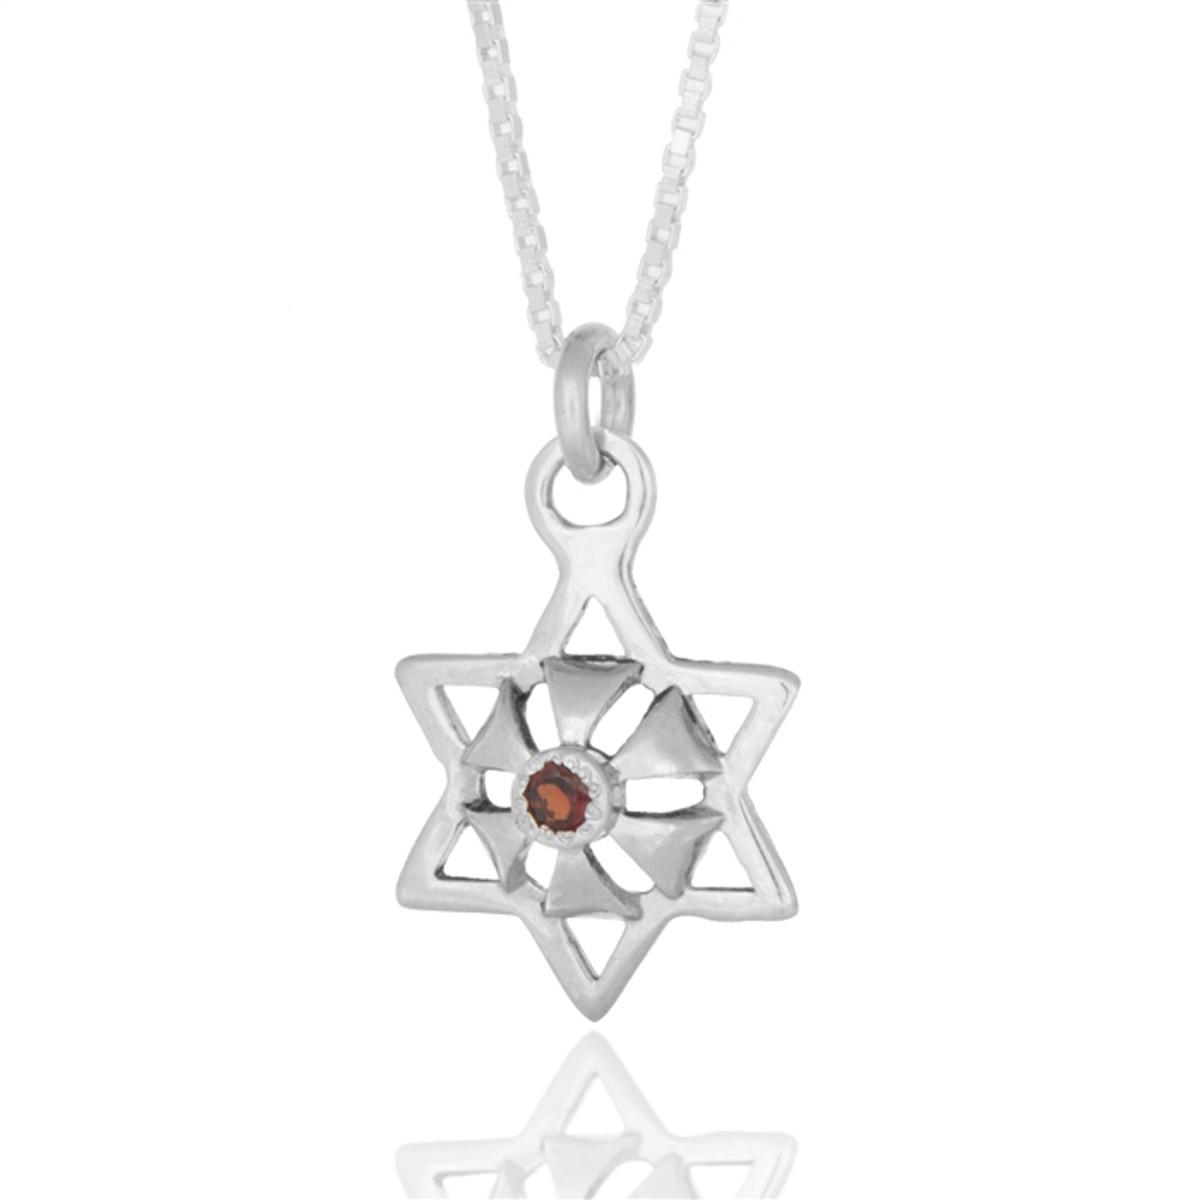 Kabbalah Silver Star Abundance Pendant With An Inserted Ruby